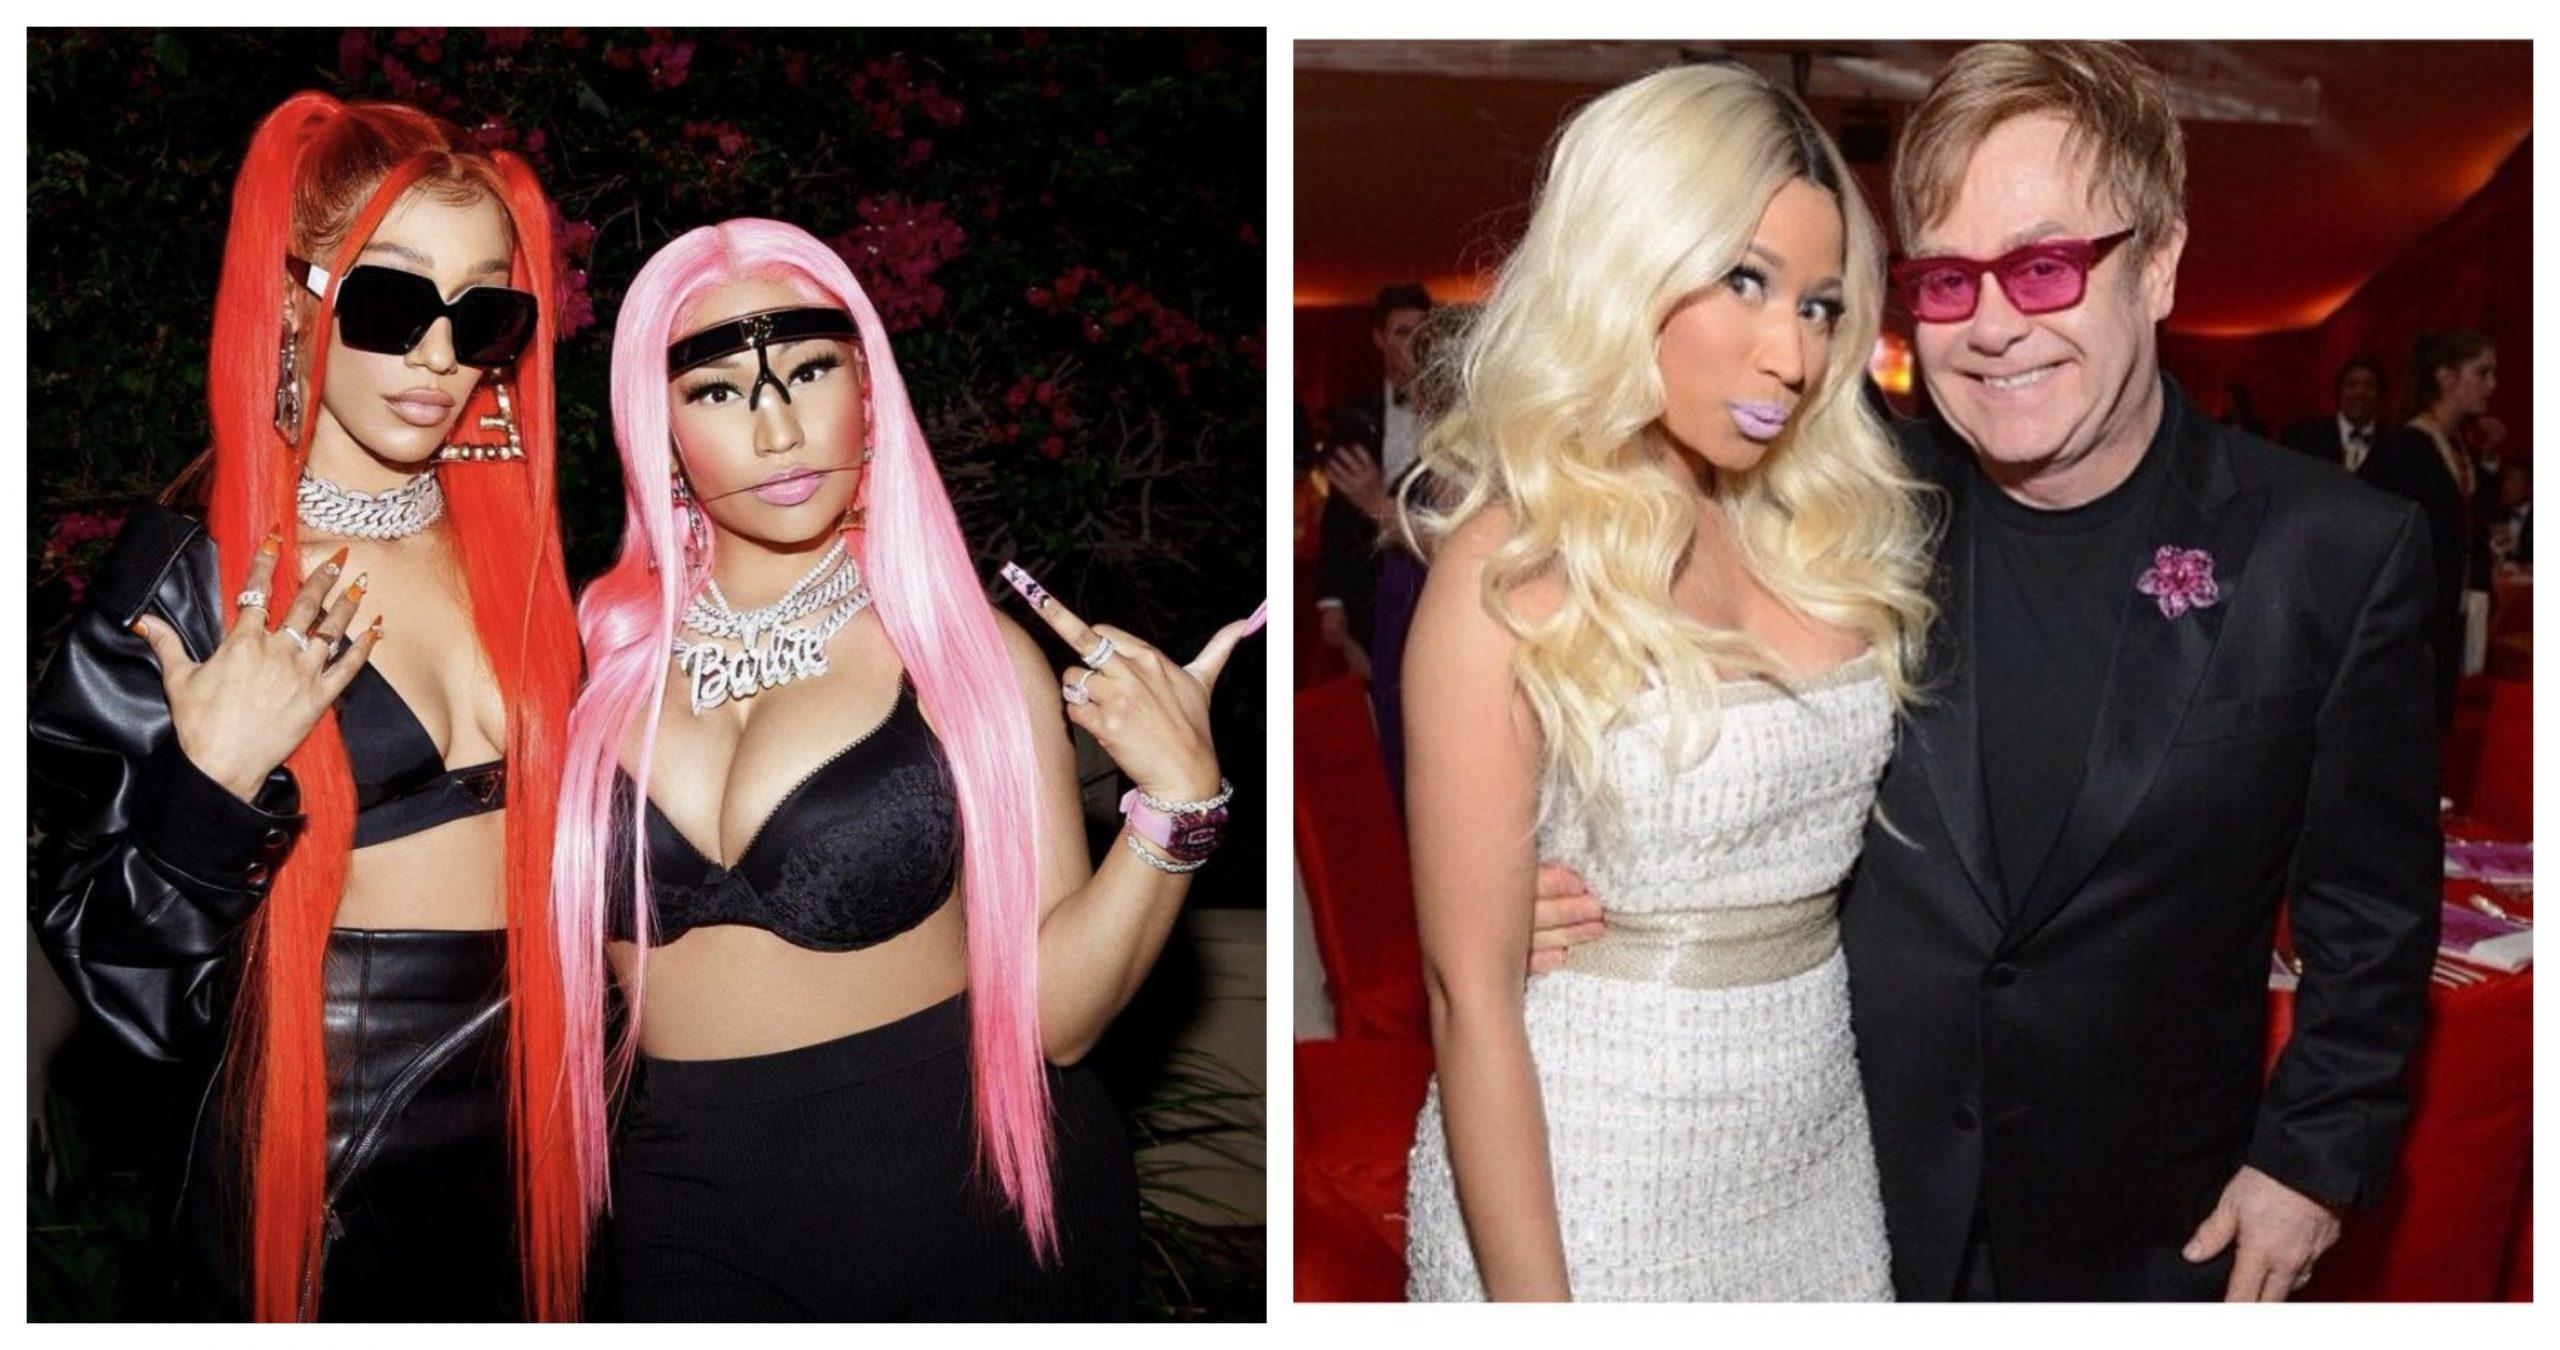 'Whole Lotta Money': Nicki Minaj Ties Elton John Record with 40th Hot 100 Top 20 Hit